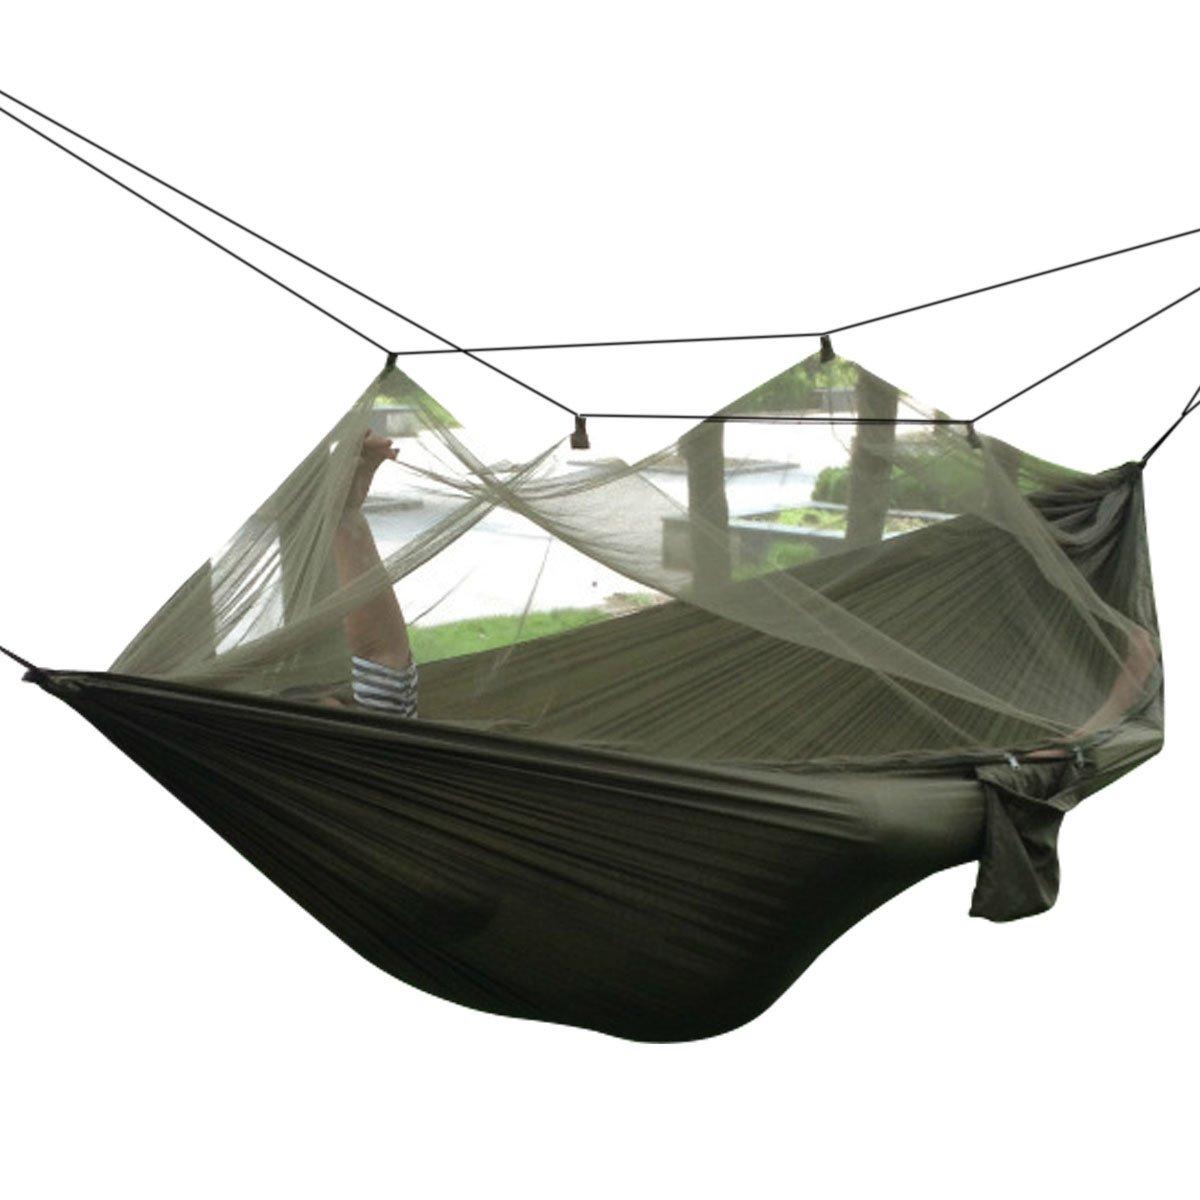 Dayincar Portable Strength Parachute Mosquito Image 1